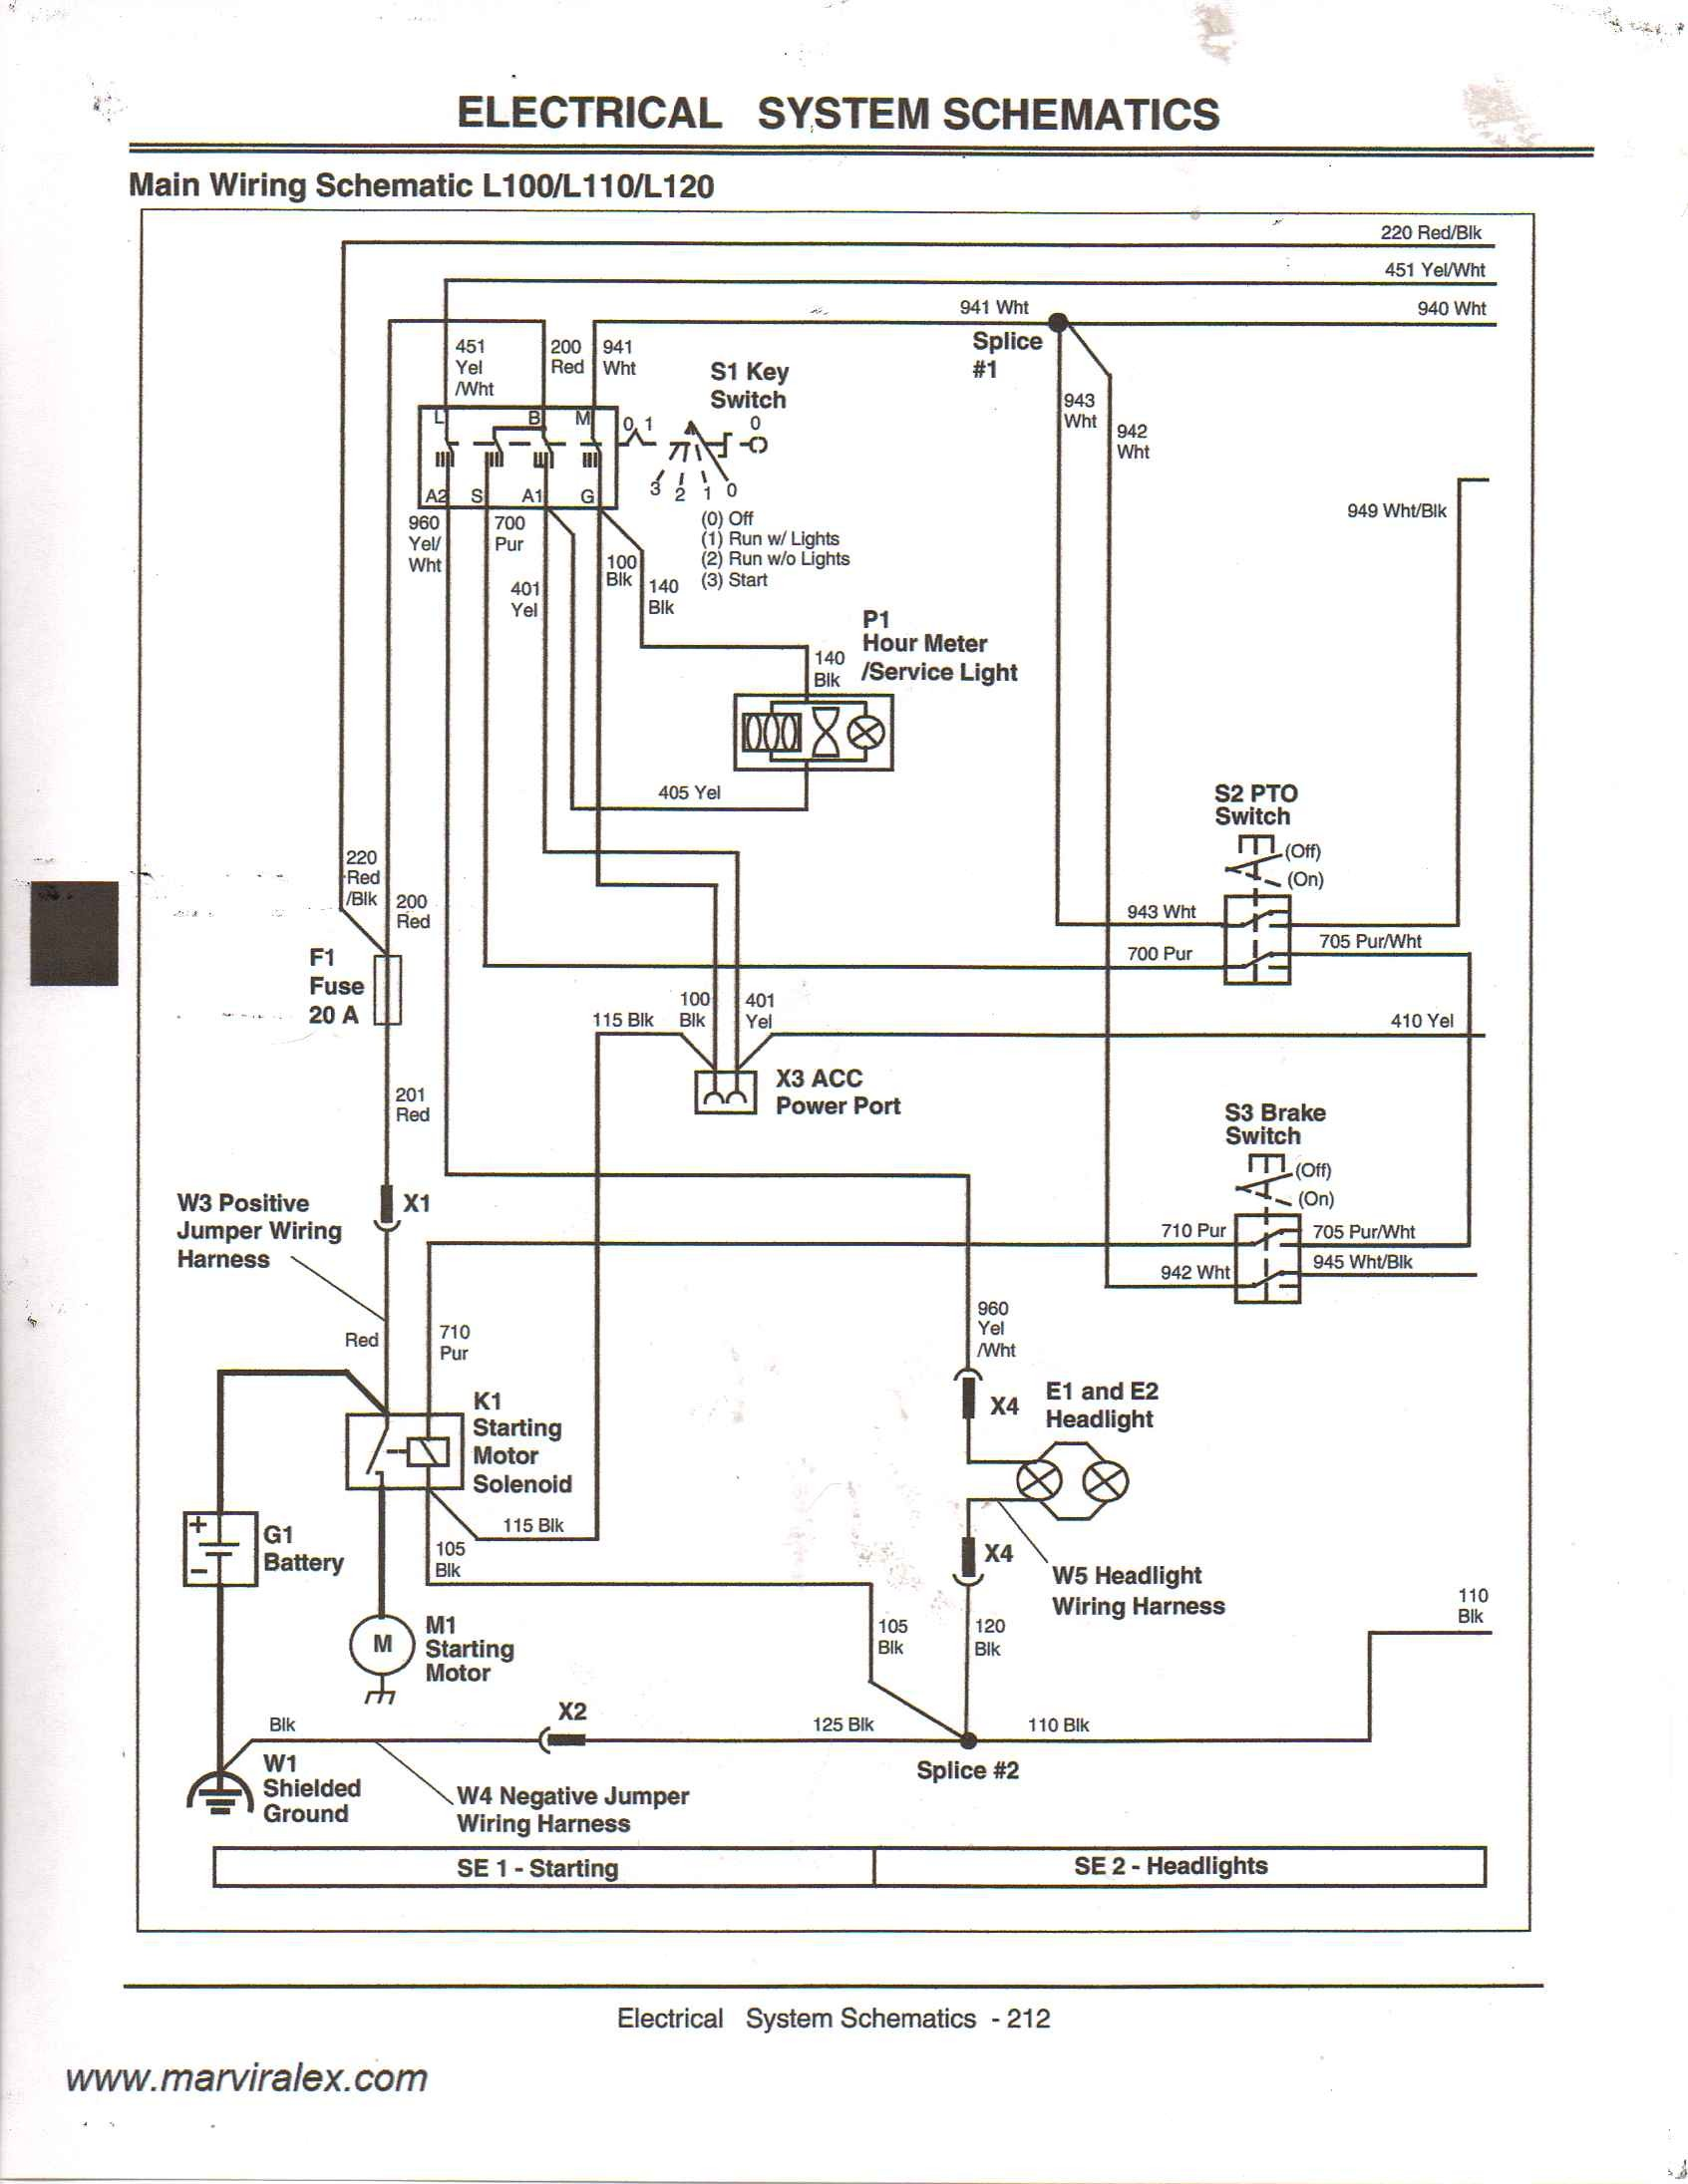 1978 John Deere Gator Electrical Diagram Ww 1570] for John Deere 1050 Tractor Wiring Diagram Free Diagram Of 1978 John Deere Gator Electrical Diagram